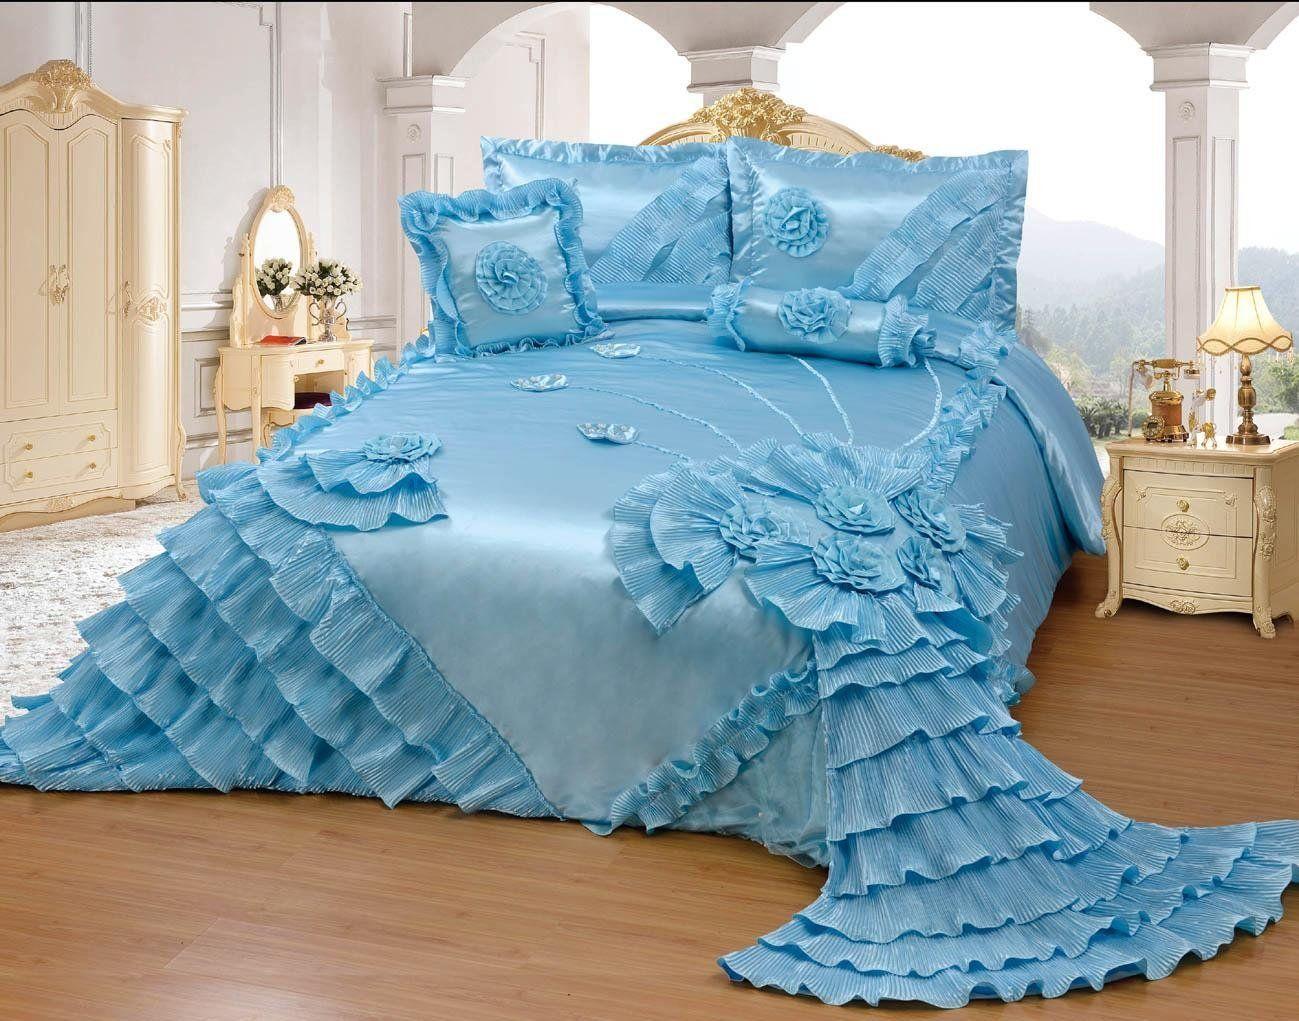 comforters oversize quilt queen amazon bedspread set quilts kitchen full octorose gold wedding royalty home bedding and com dp